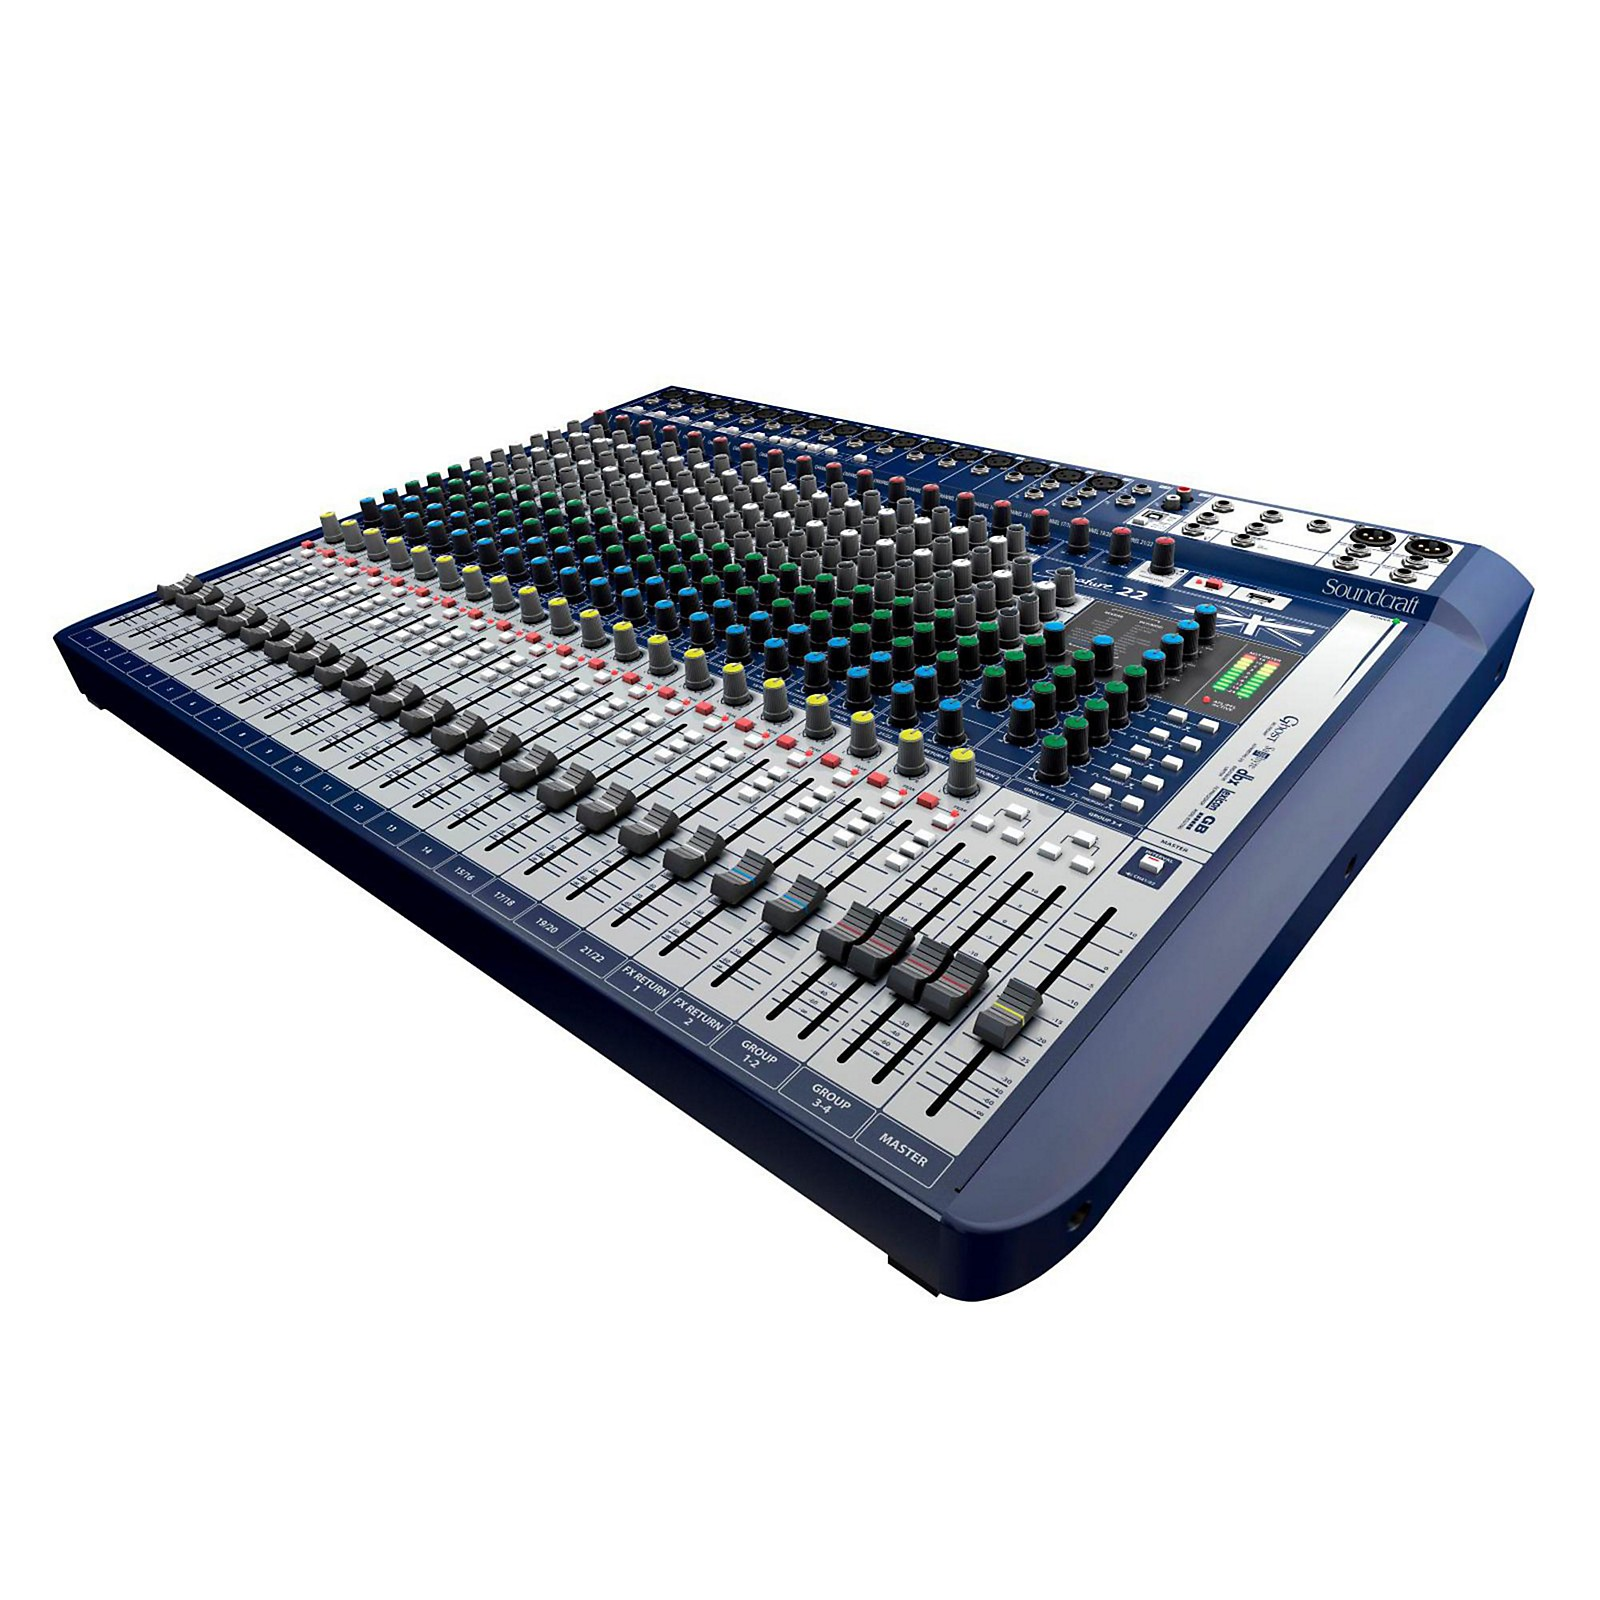 Open Box Soundcraft Signature 22 22-Input Analog Mixer with Effects